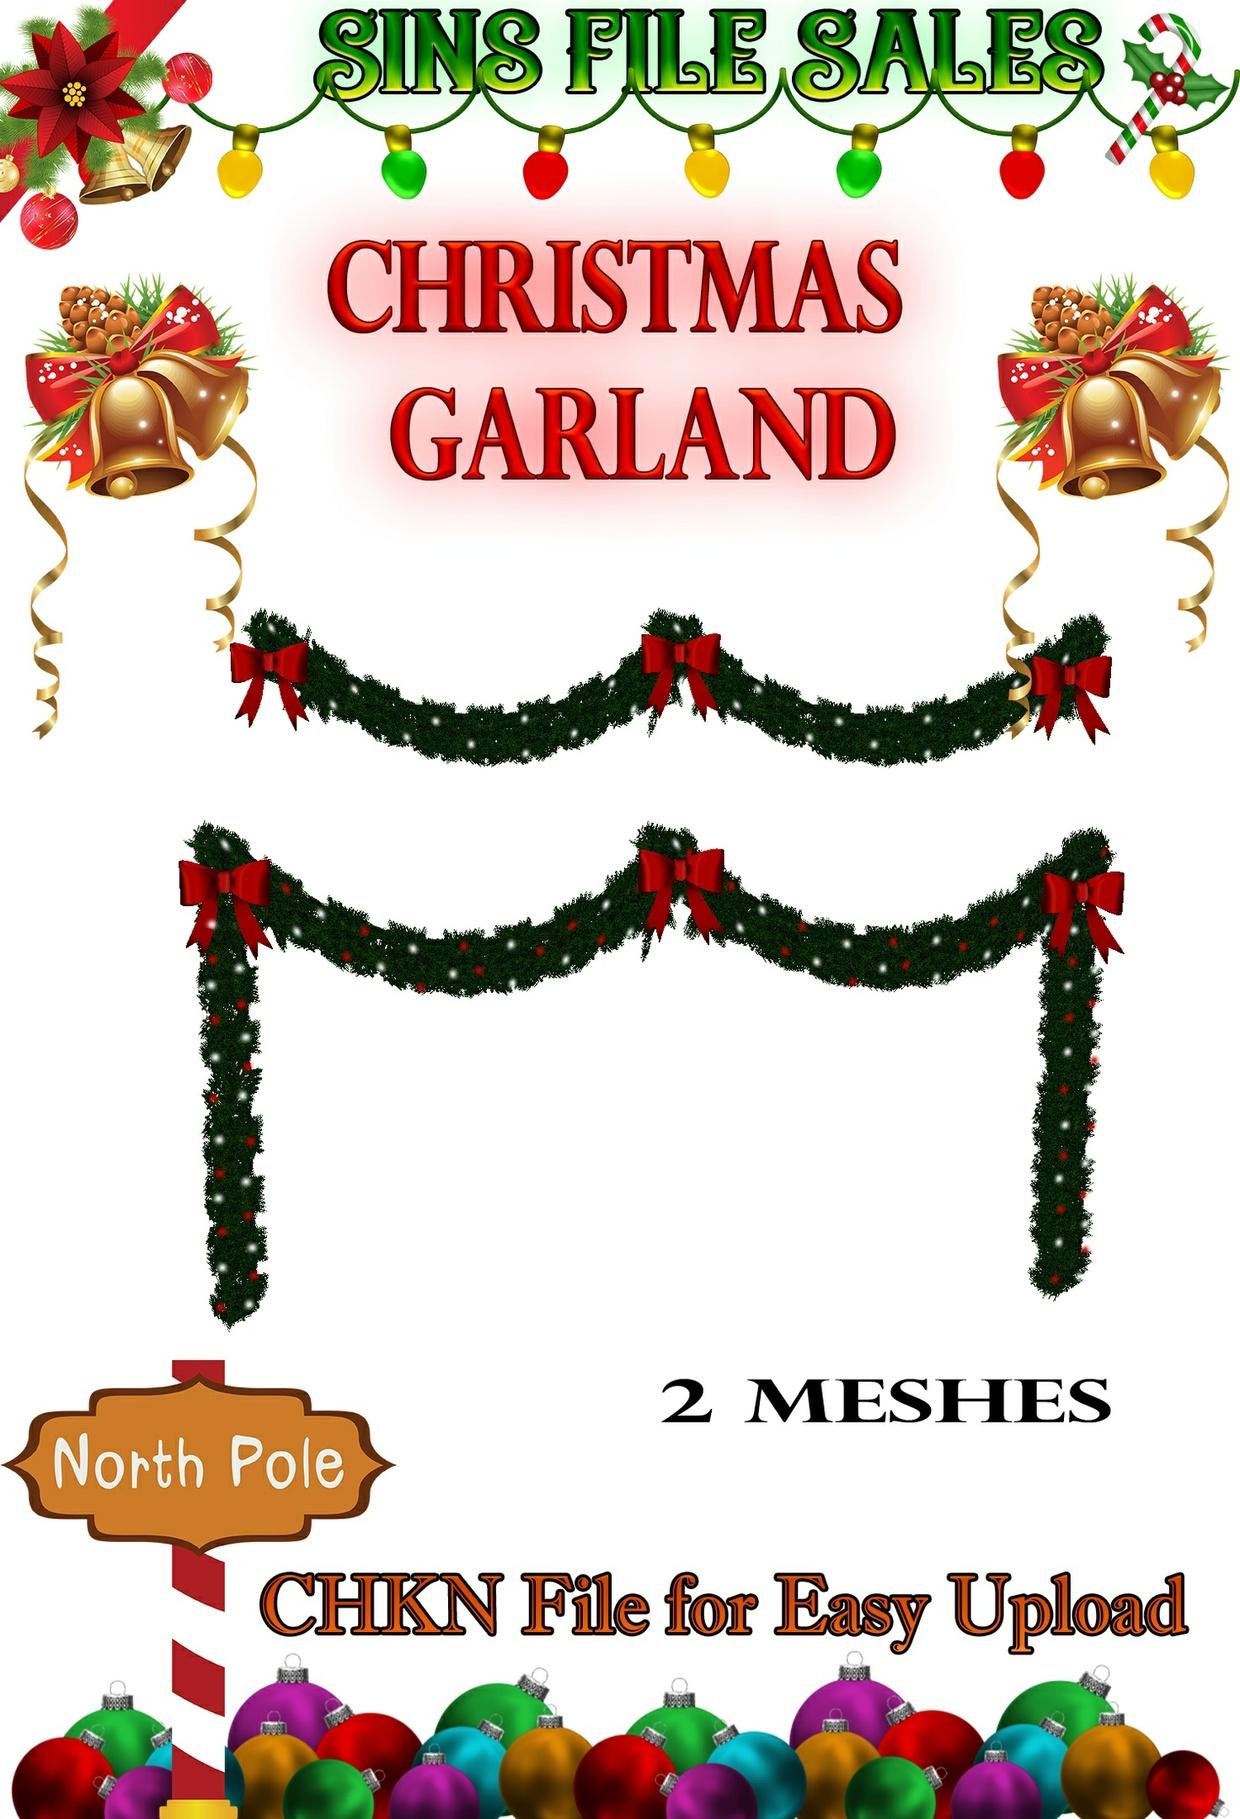 Christmas Garland 2 Meshes * CHKN Files